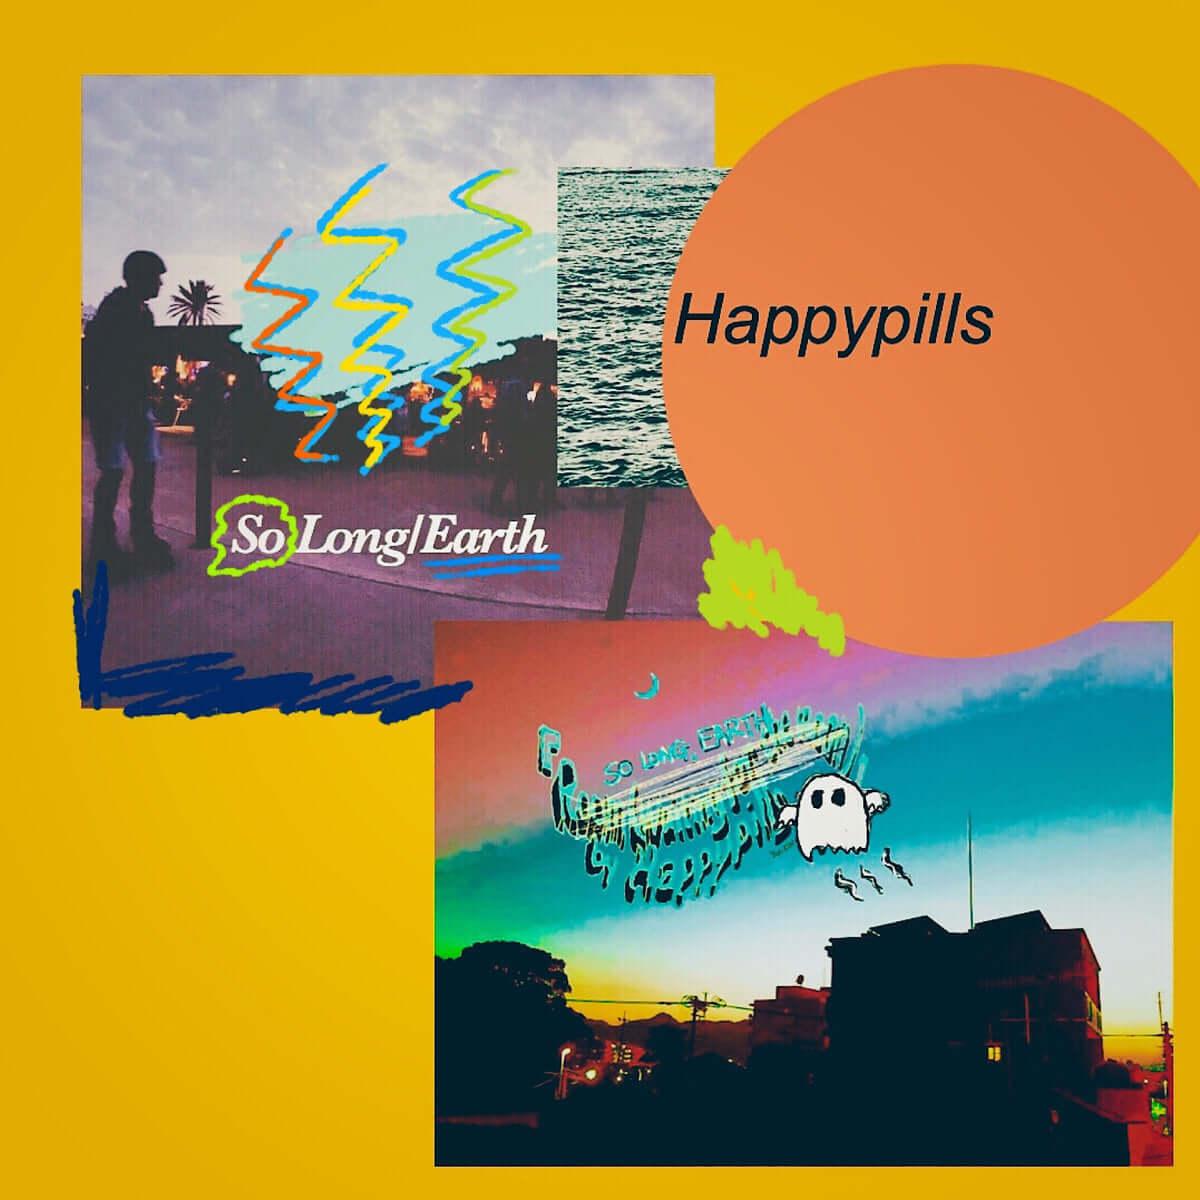 Ano(t)raksのDai OgasawaraによるインターネットのIndie Pop 最新7選 anotracks190121-indie-pop-2-1200x1200